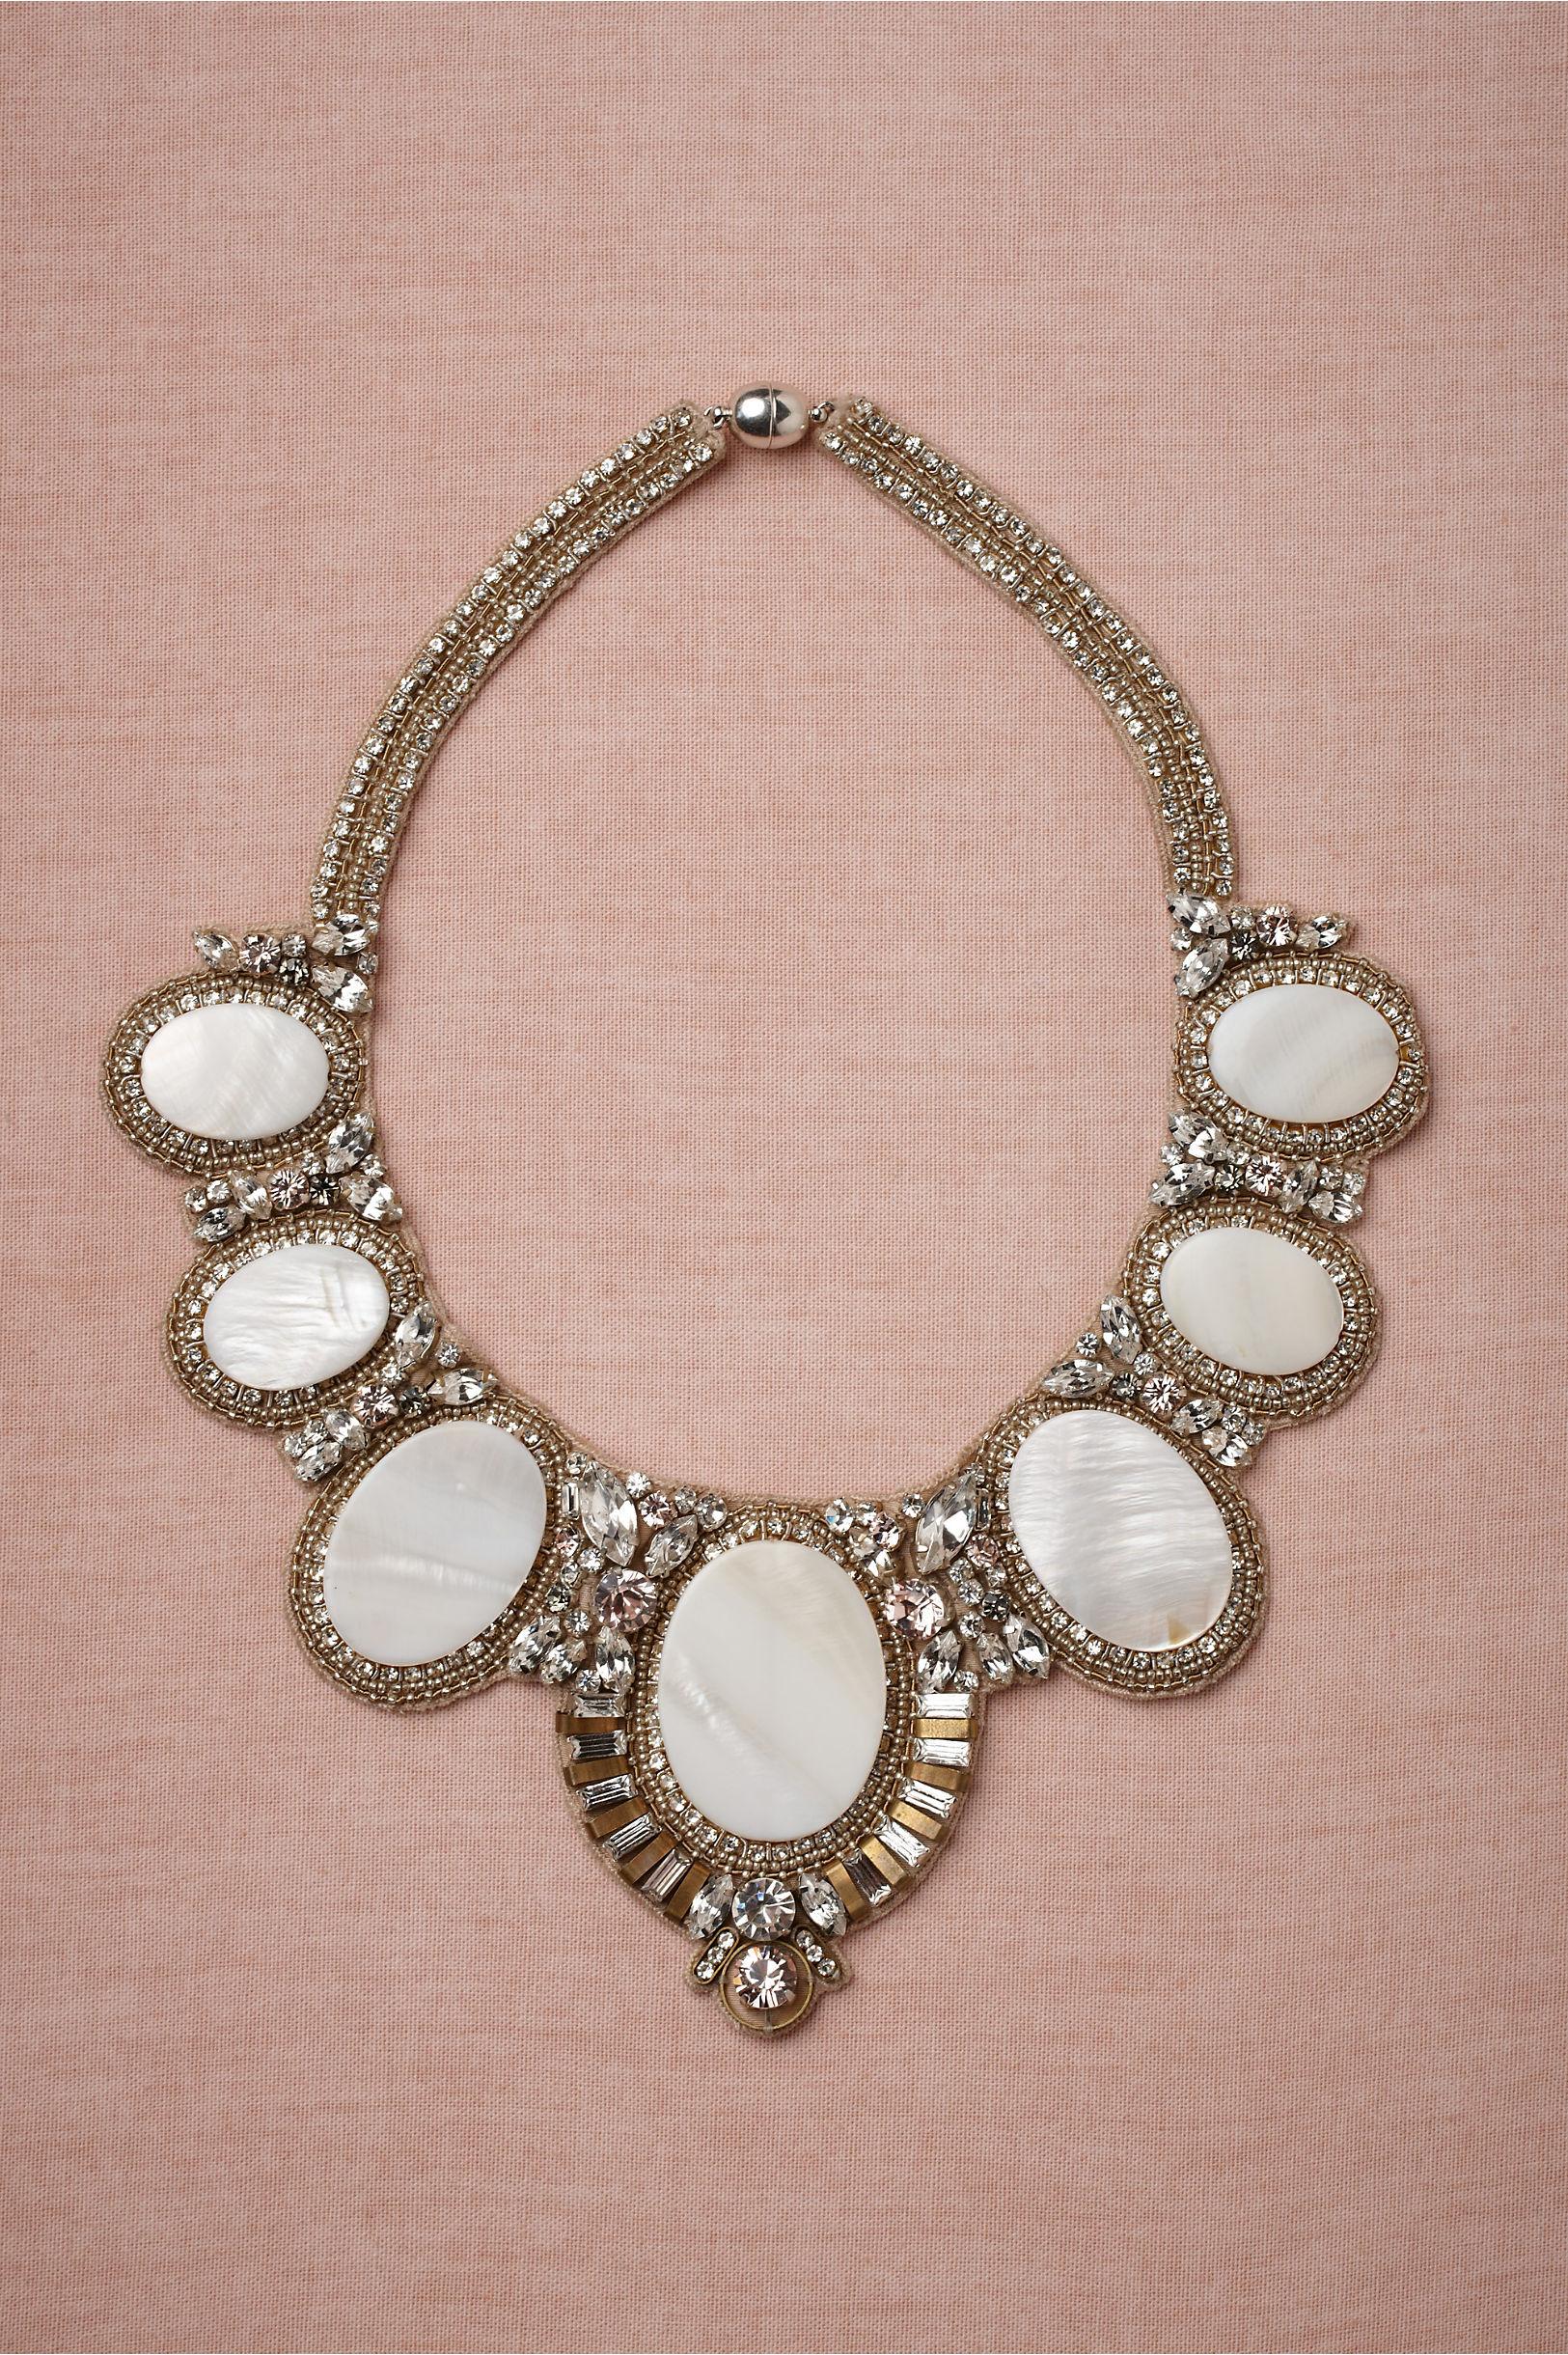 bhldn bridal gowns wedding jewelry statement necklace 1